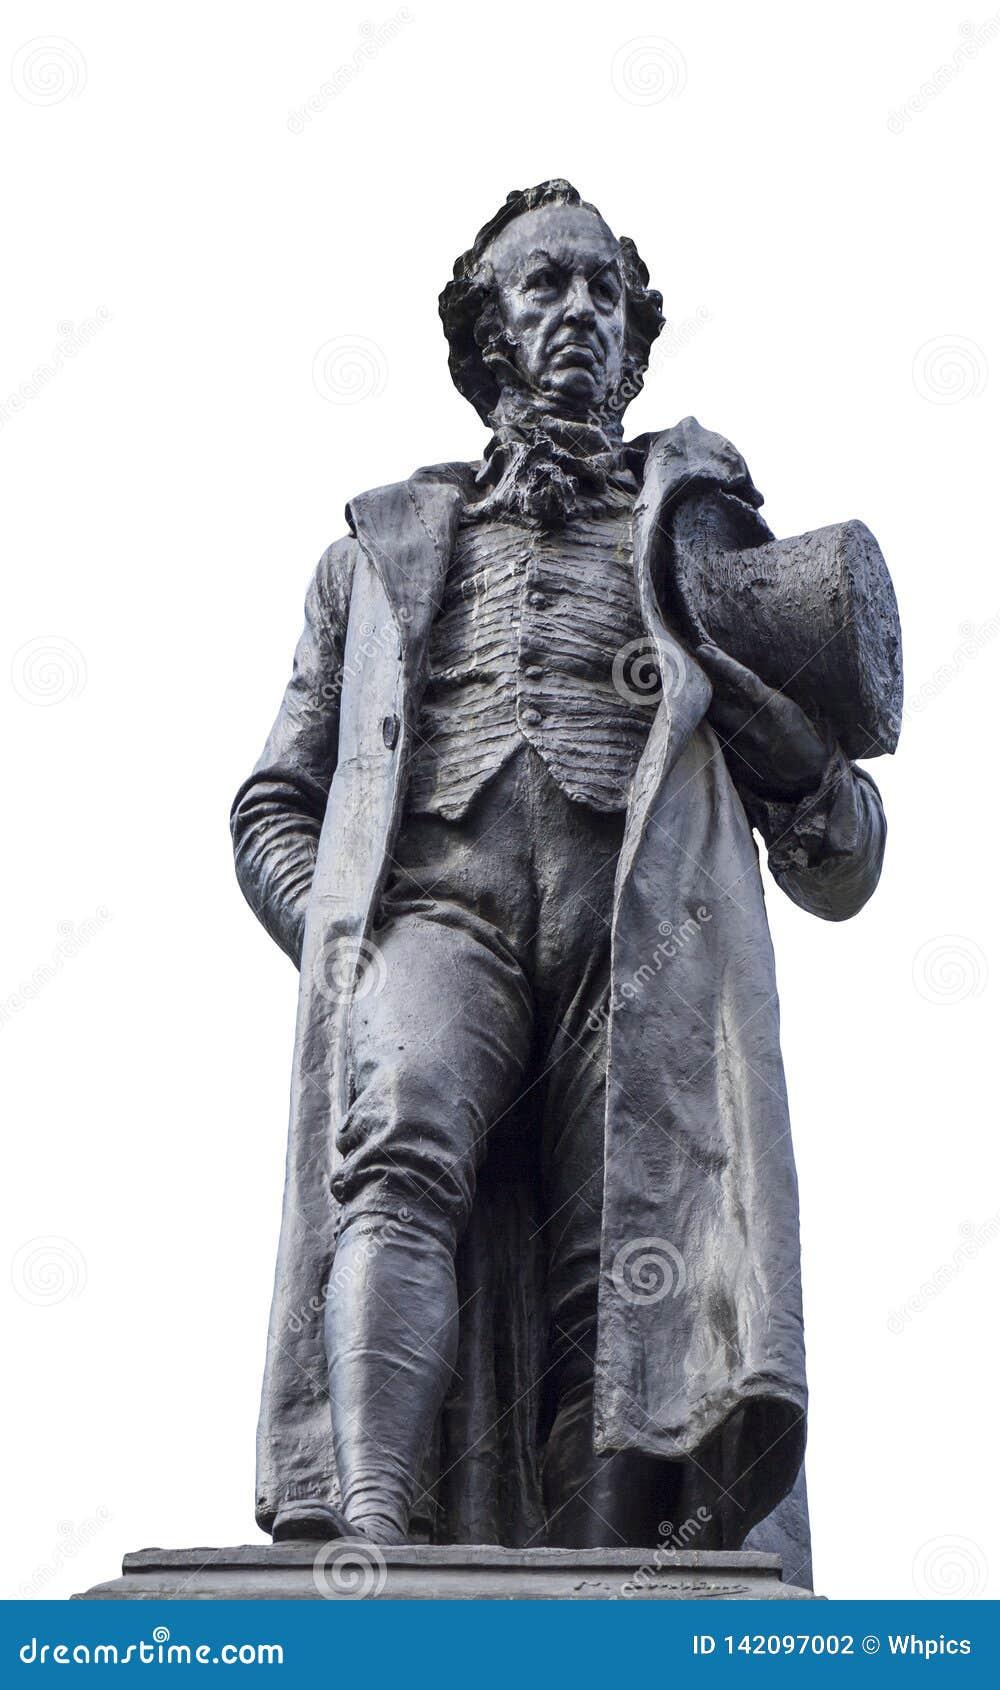 Estátua de bronze de Francisco de Goya